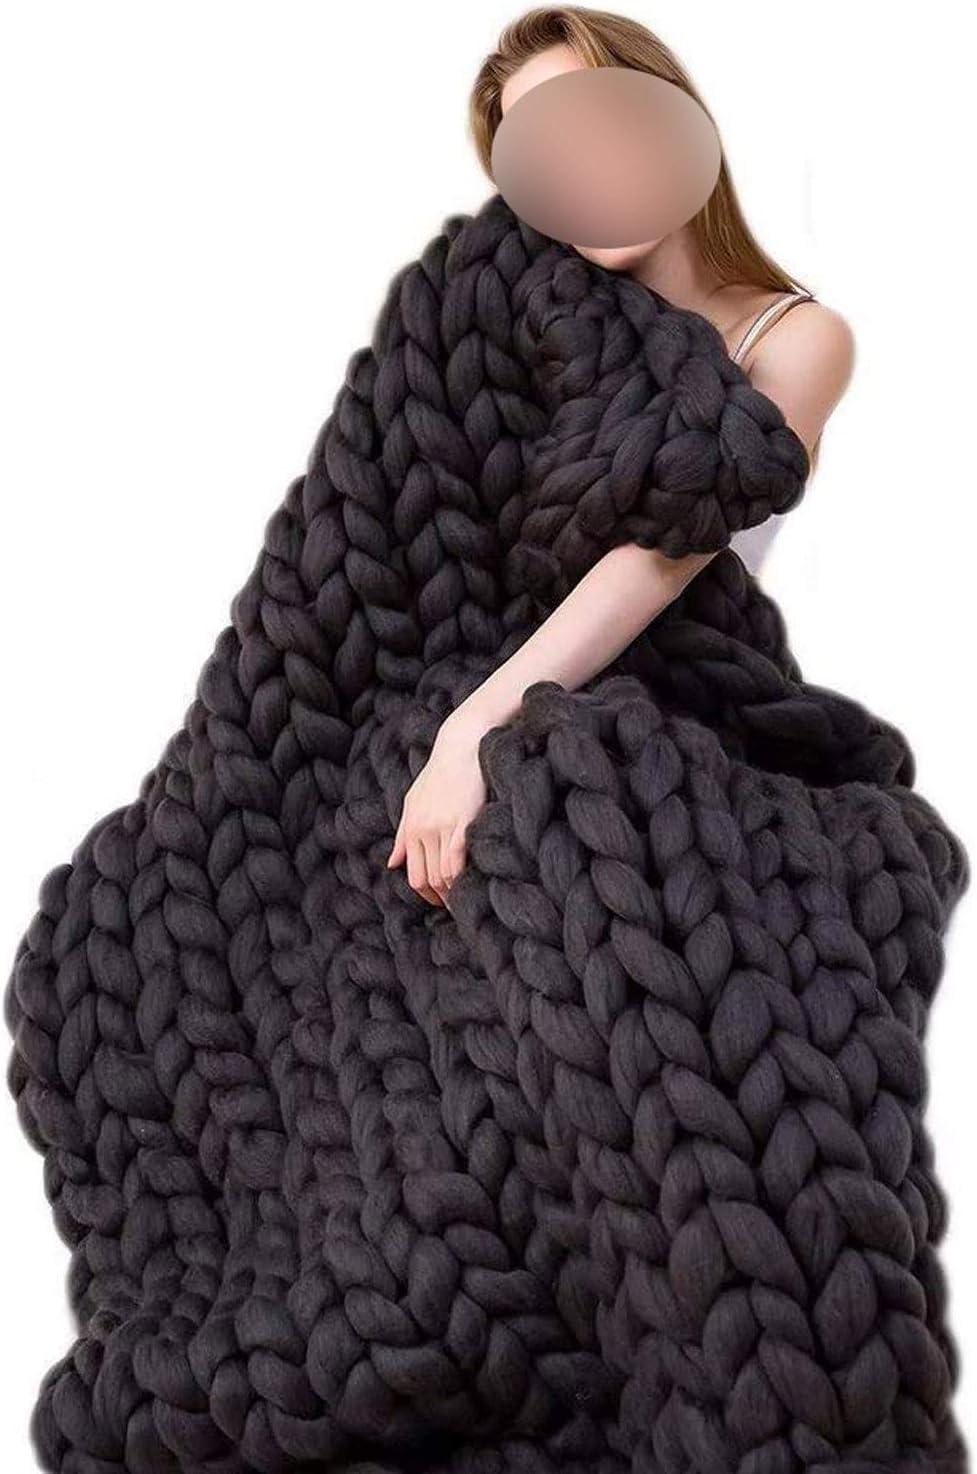 QWERTYUKJ Chunky unisex Knit Blanket Throw Handmade depot Ready Gift Packagin